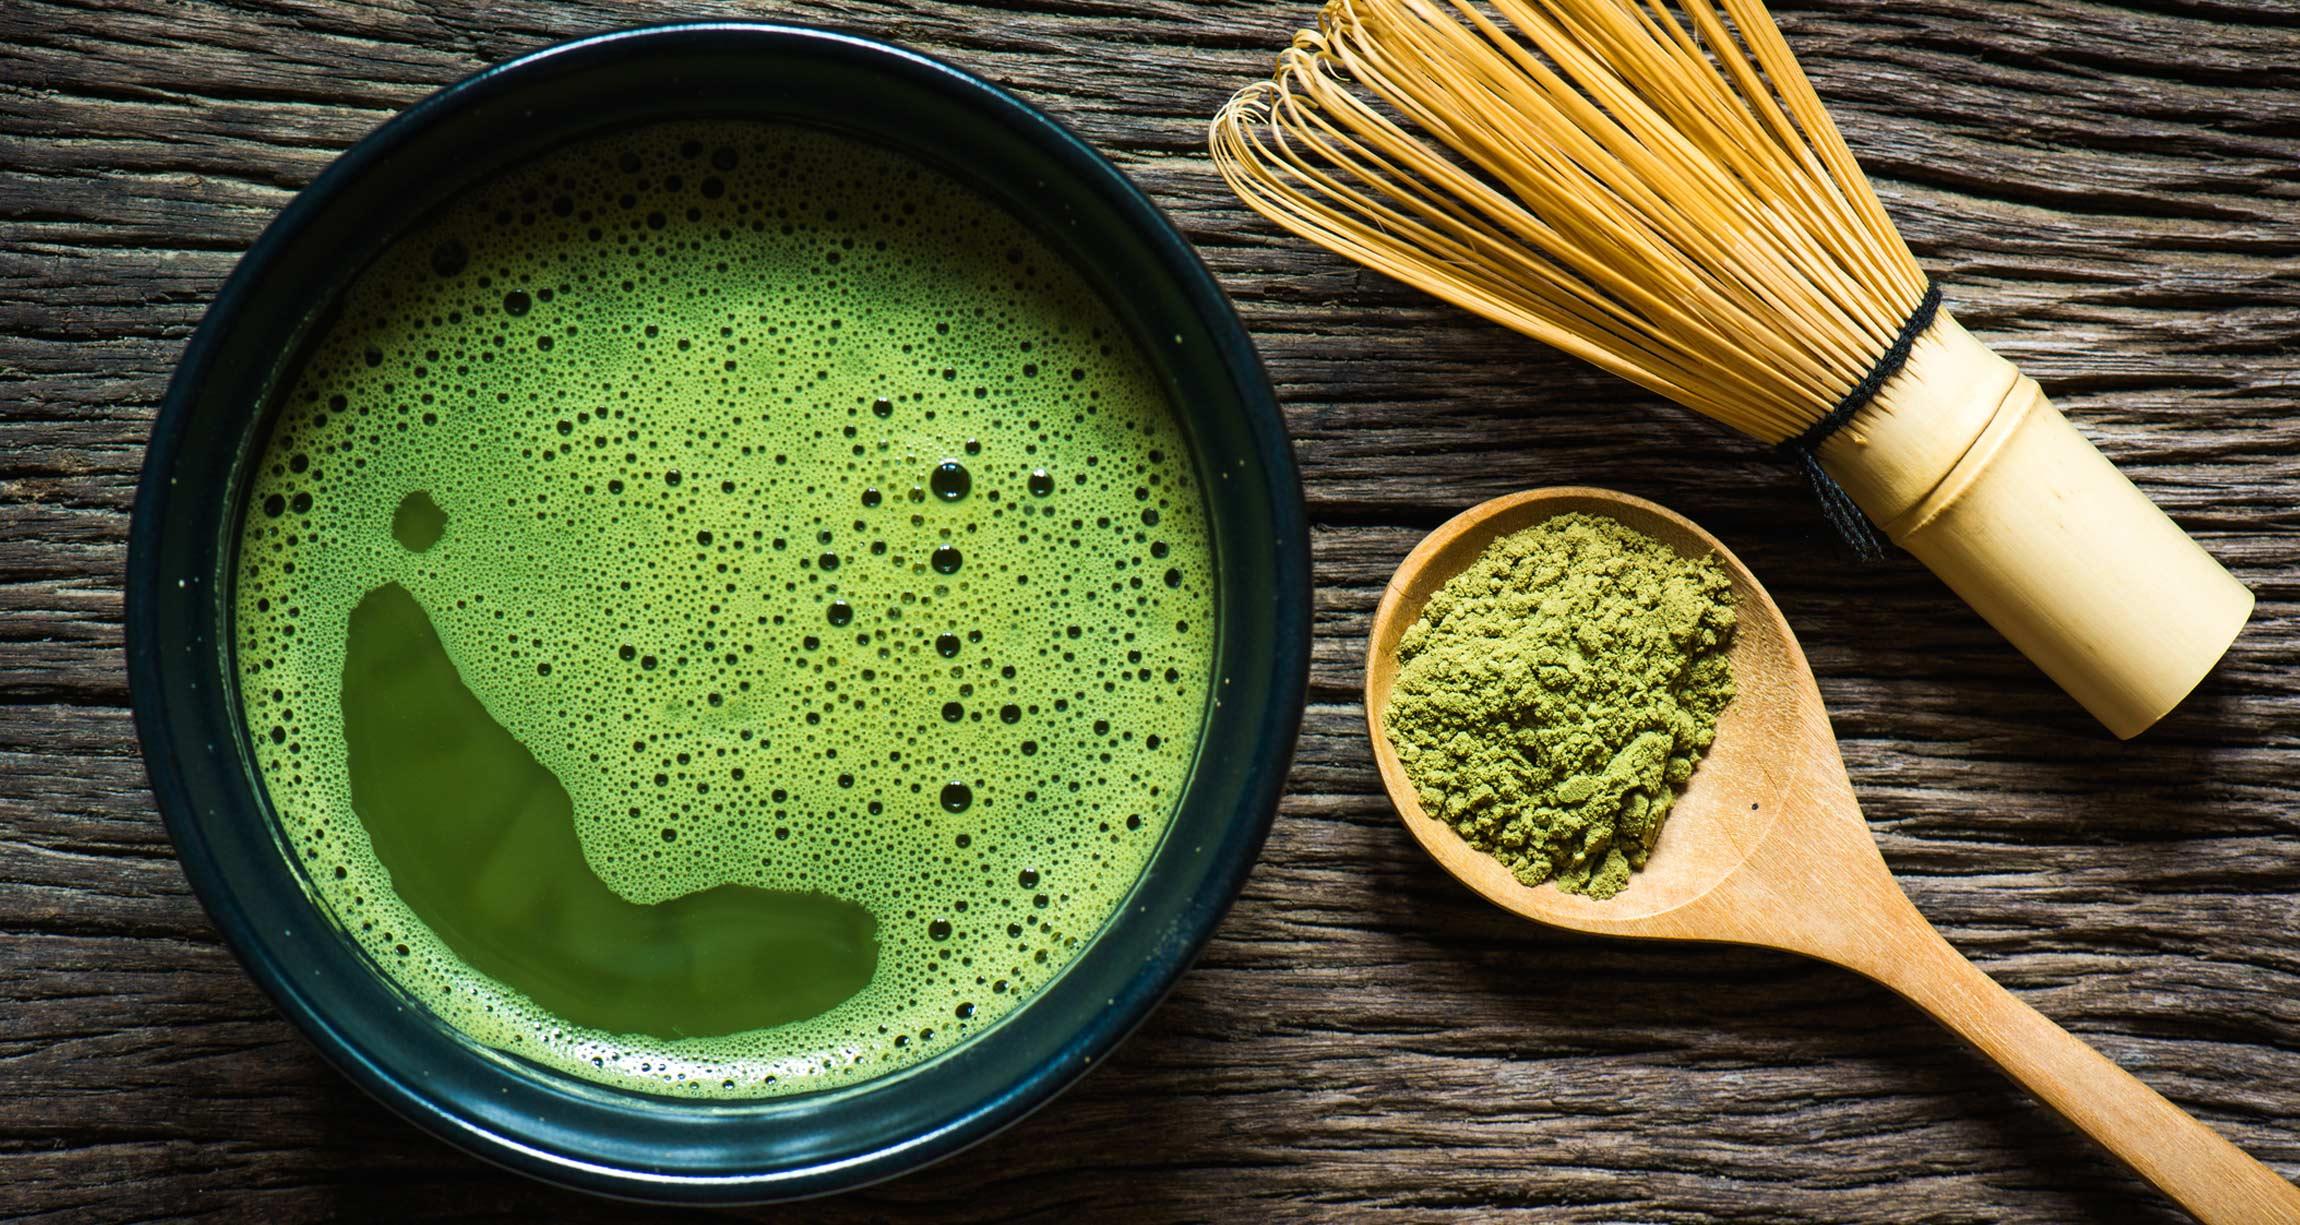 5 Science Backed Reasons To Drink Matcha Tea Matcha Tea Health Benefits Matcha Tea Benefits Matcha Green Tea